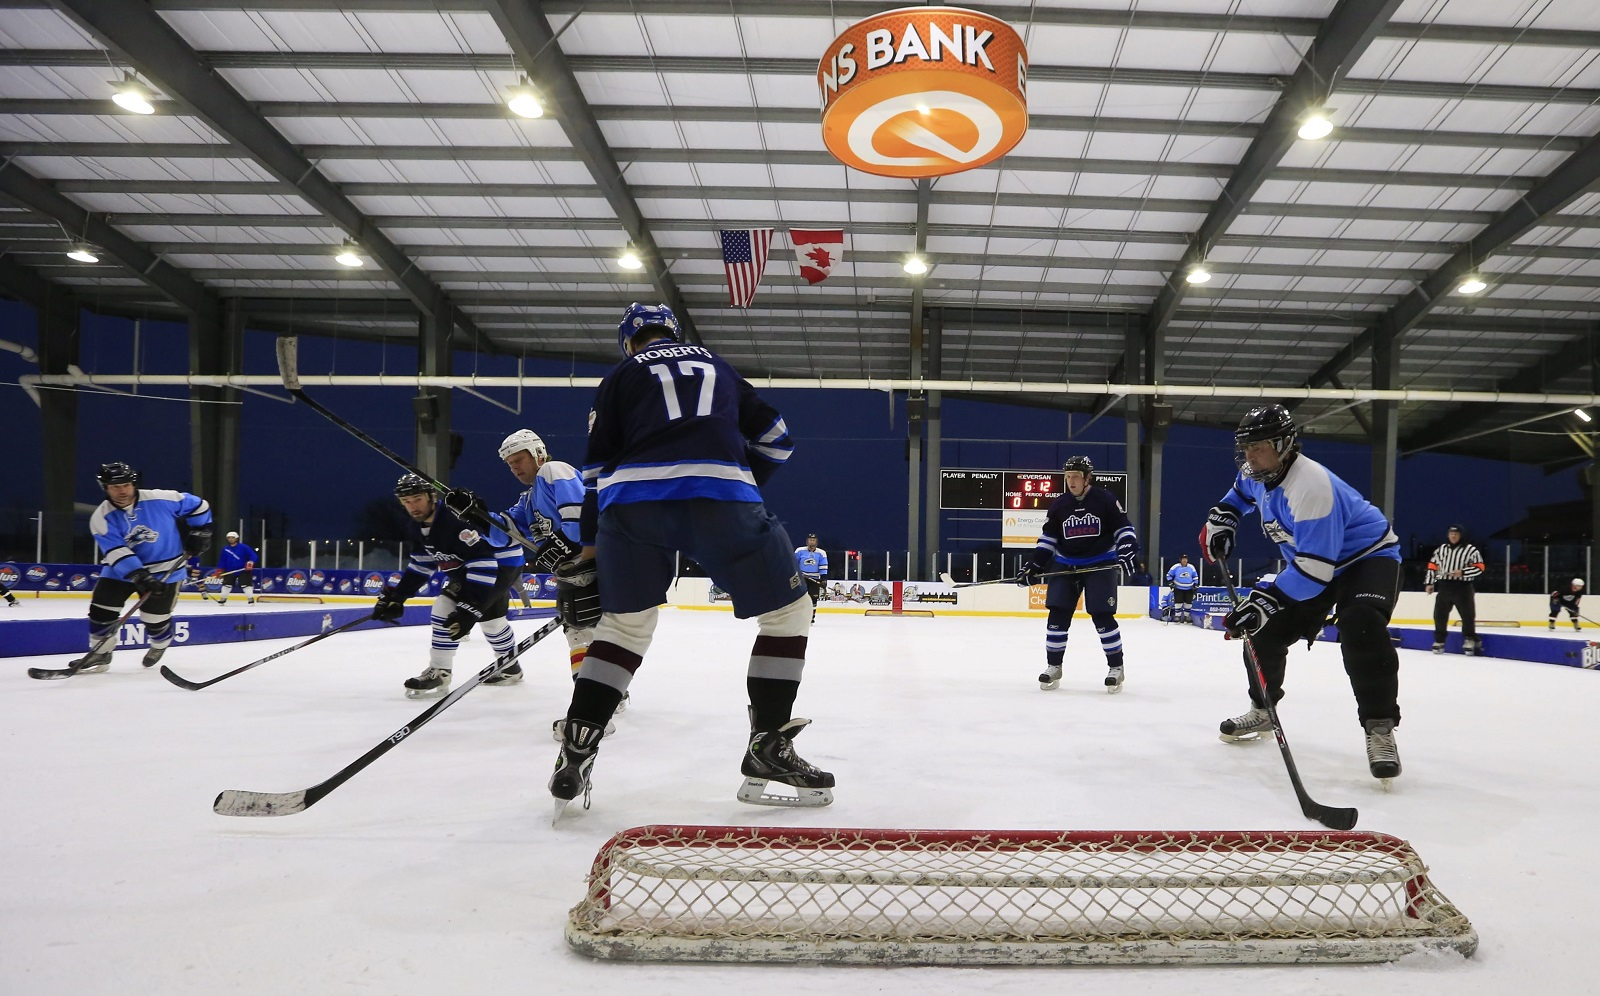 100 Things Watch Labatt Blue Pond Hockey Tournament The Buffalo News